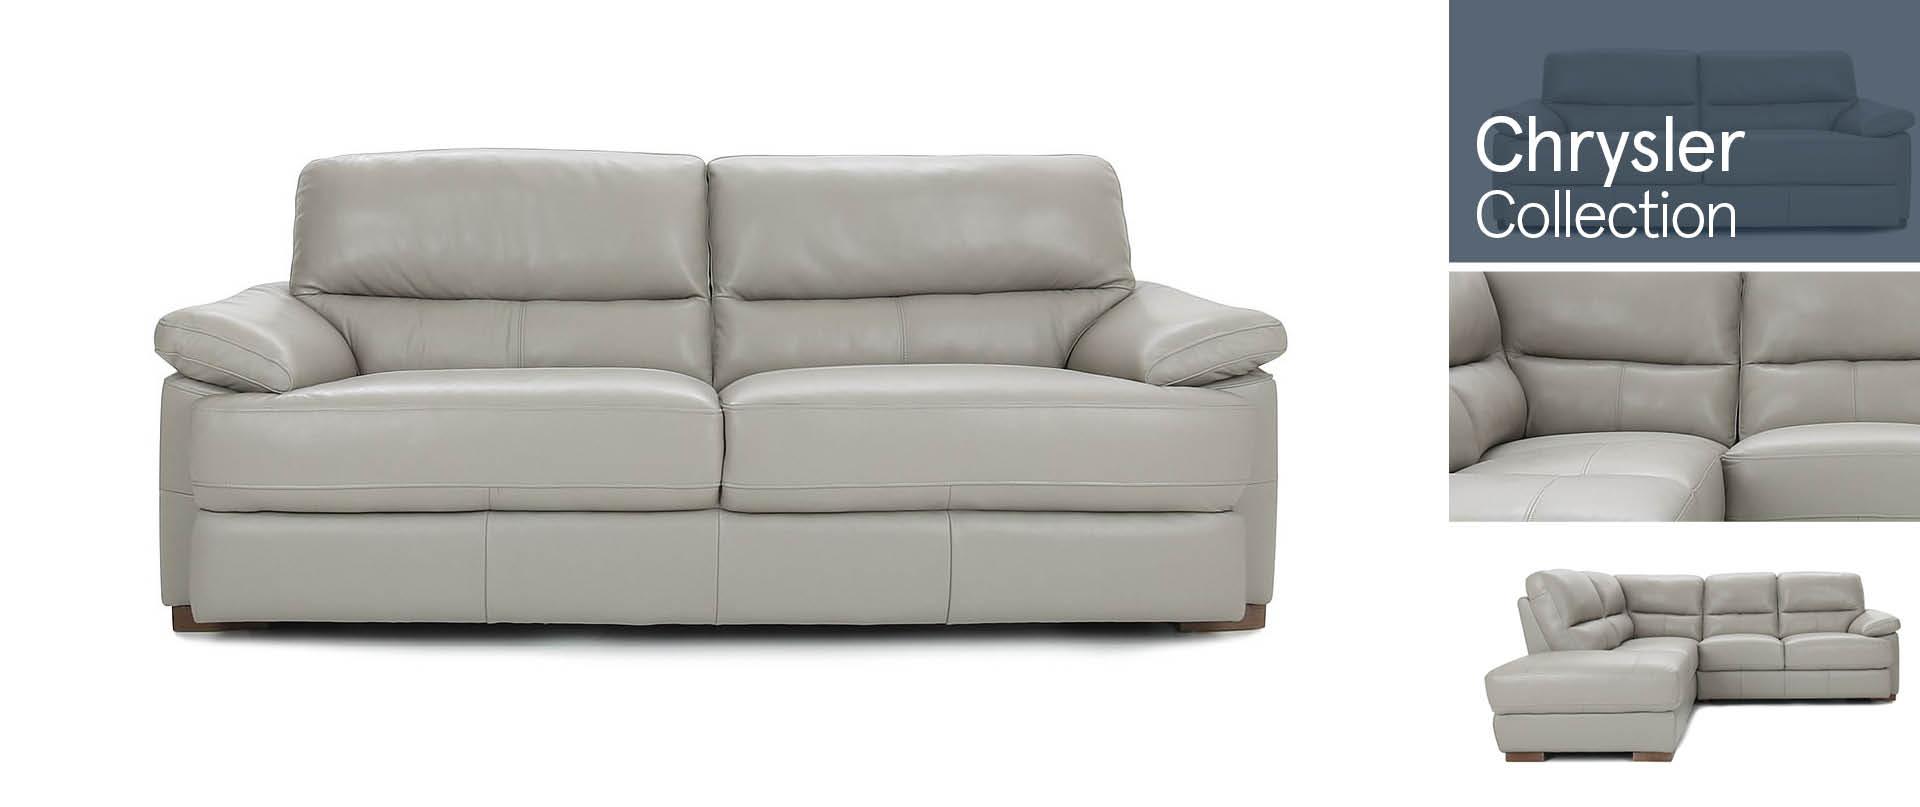 Chrysler Leather Sofa Ranges